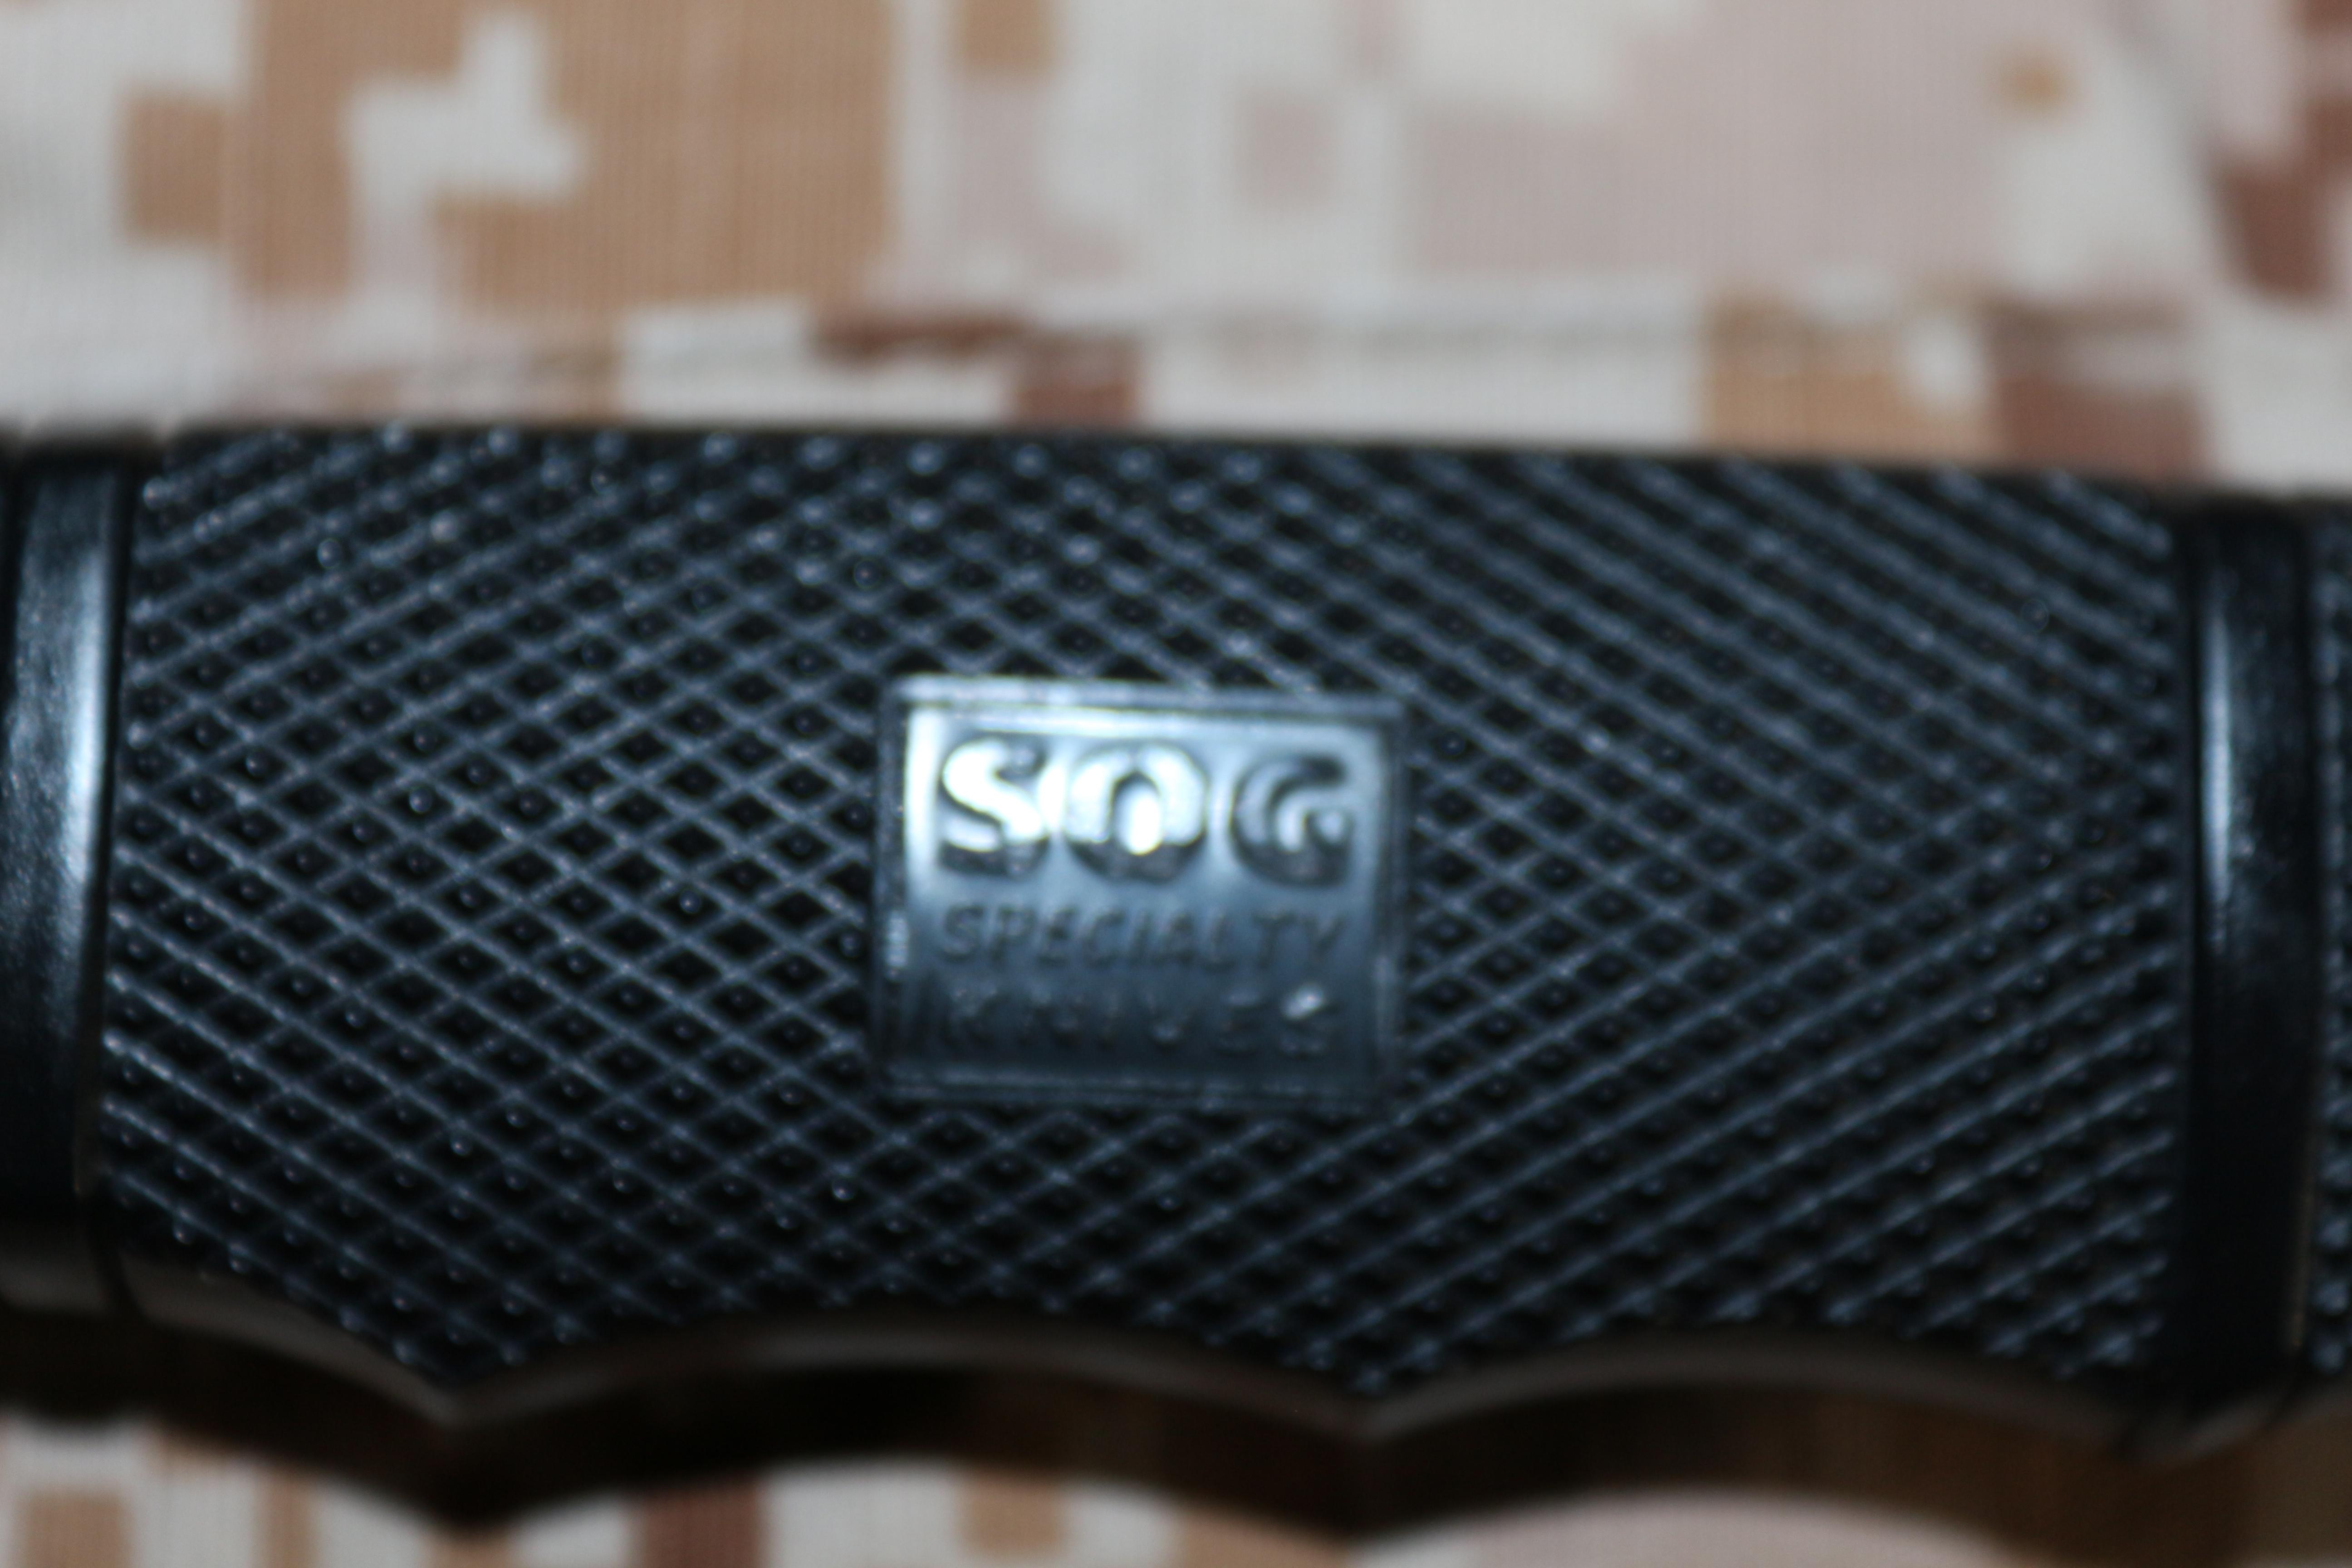 Review cuchillo sog seal (dummy) Bg2w